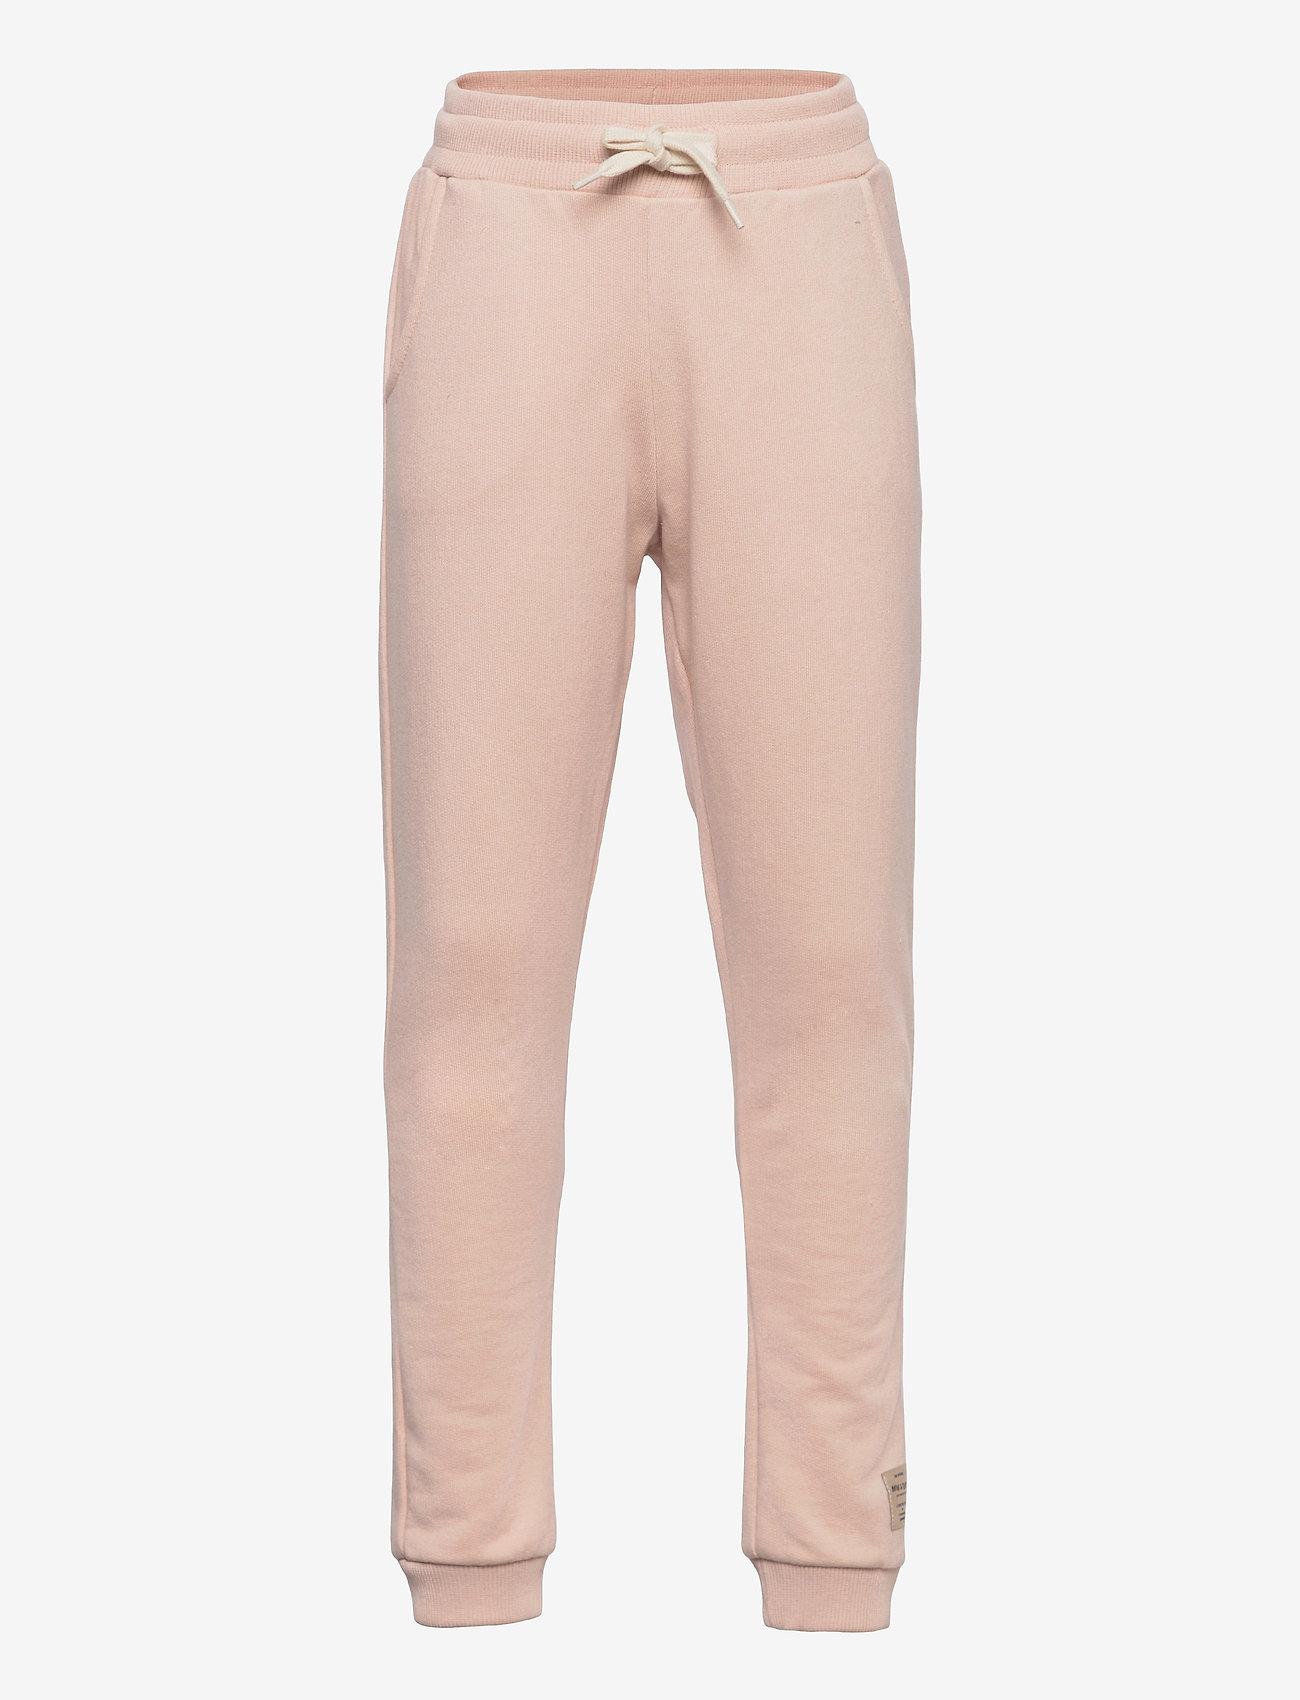 Mini A Ture - Even pants, K - joggingbroek - rose dust - 0